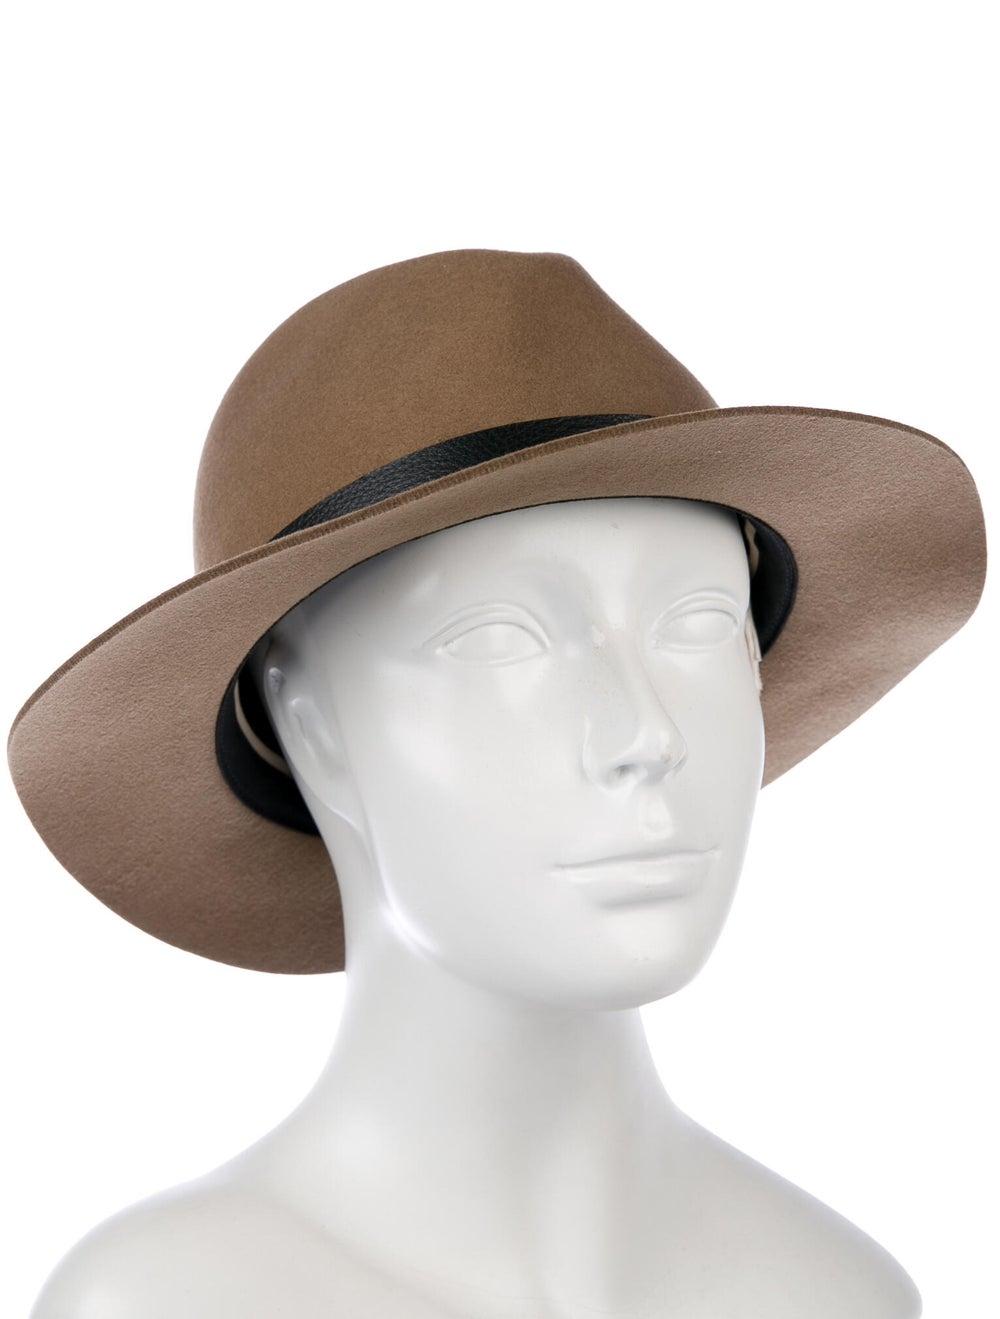 Rag & Bone Wool Fedora Hat Brown - image 3